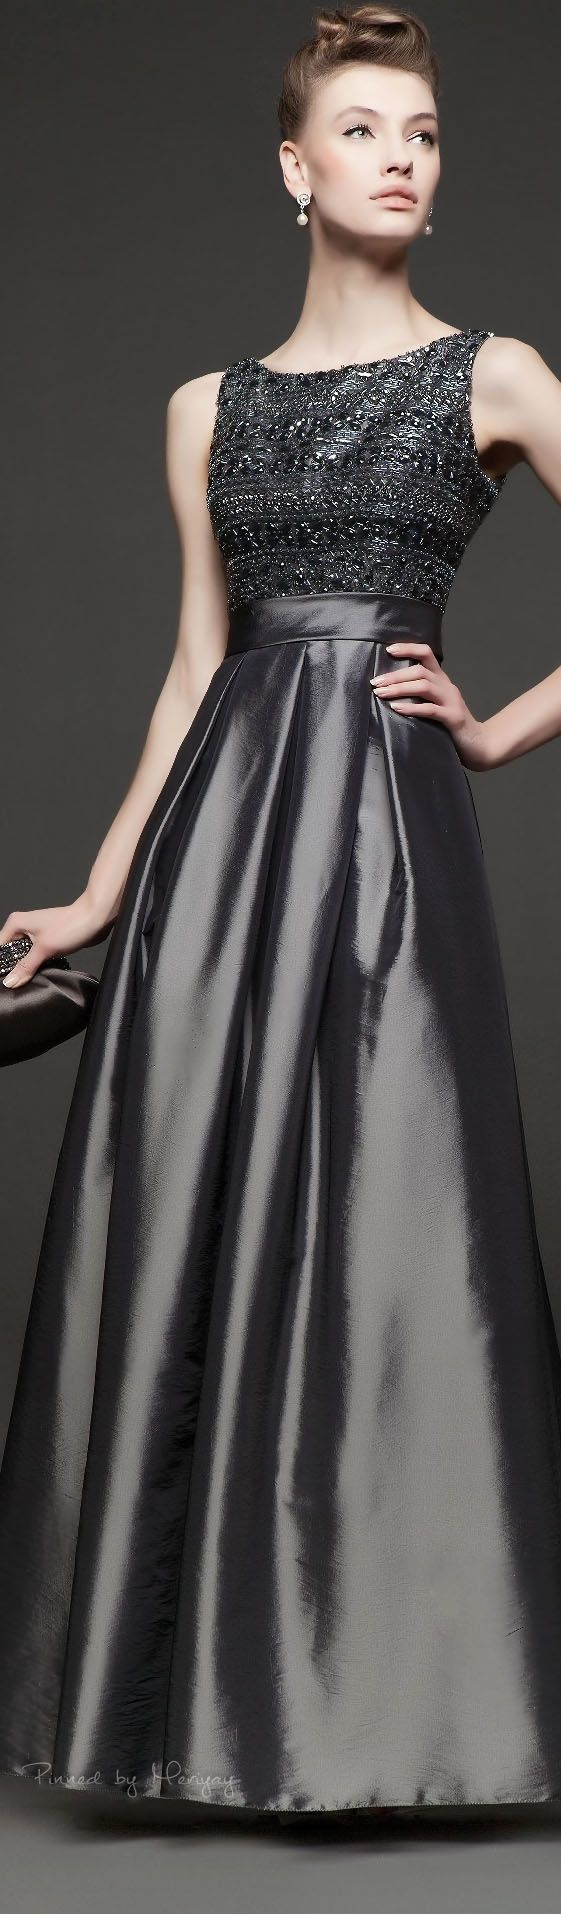 Rosaclara runway fashion ropa pinterest rosa clara gowns